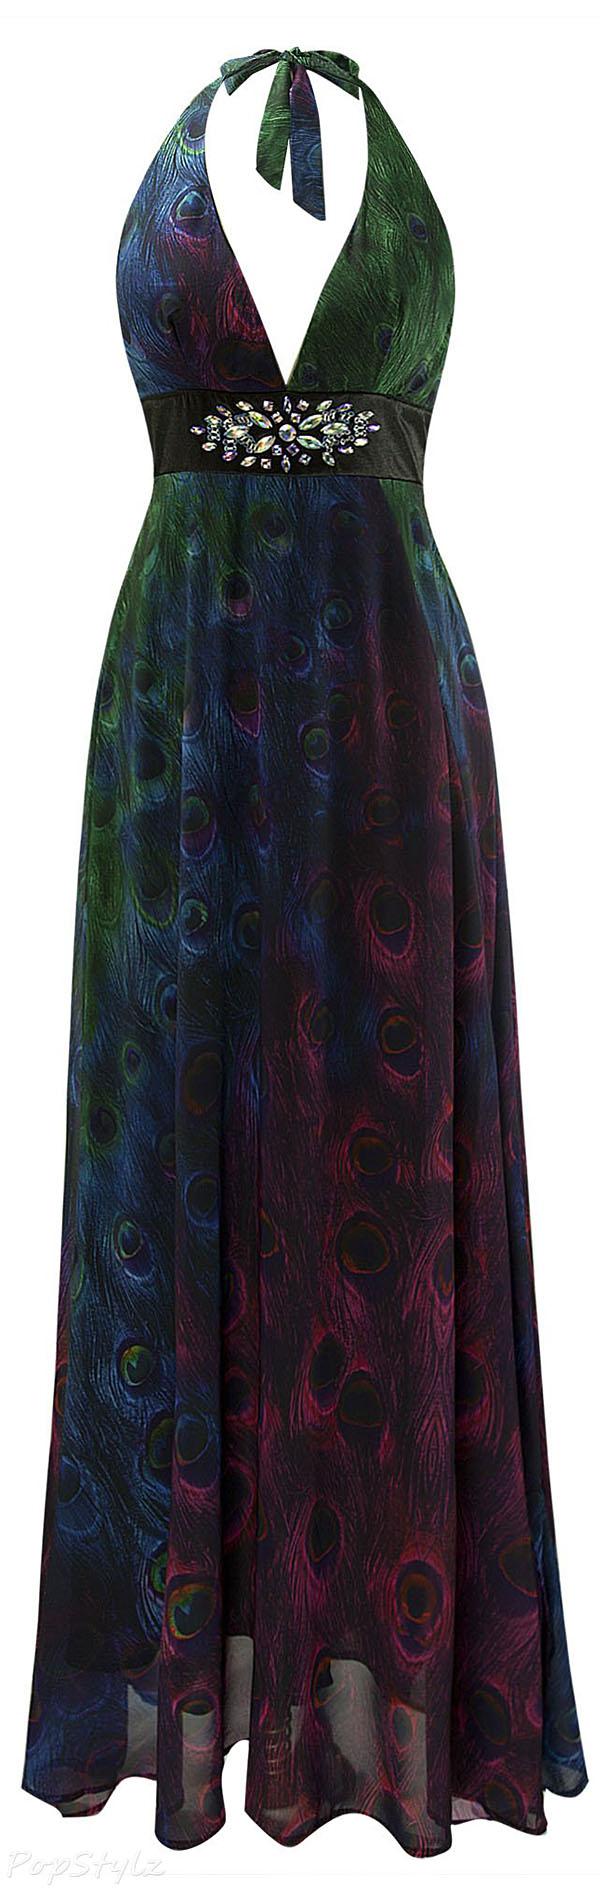 Angel-fashions Backless Beaded Chiffon Peacock Evening Dress